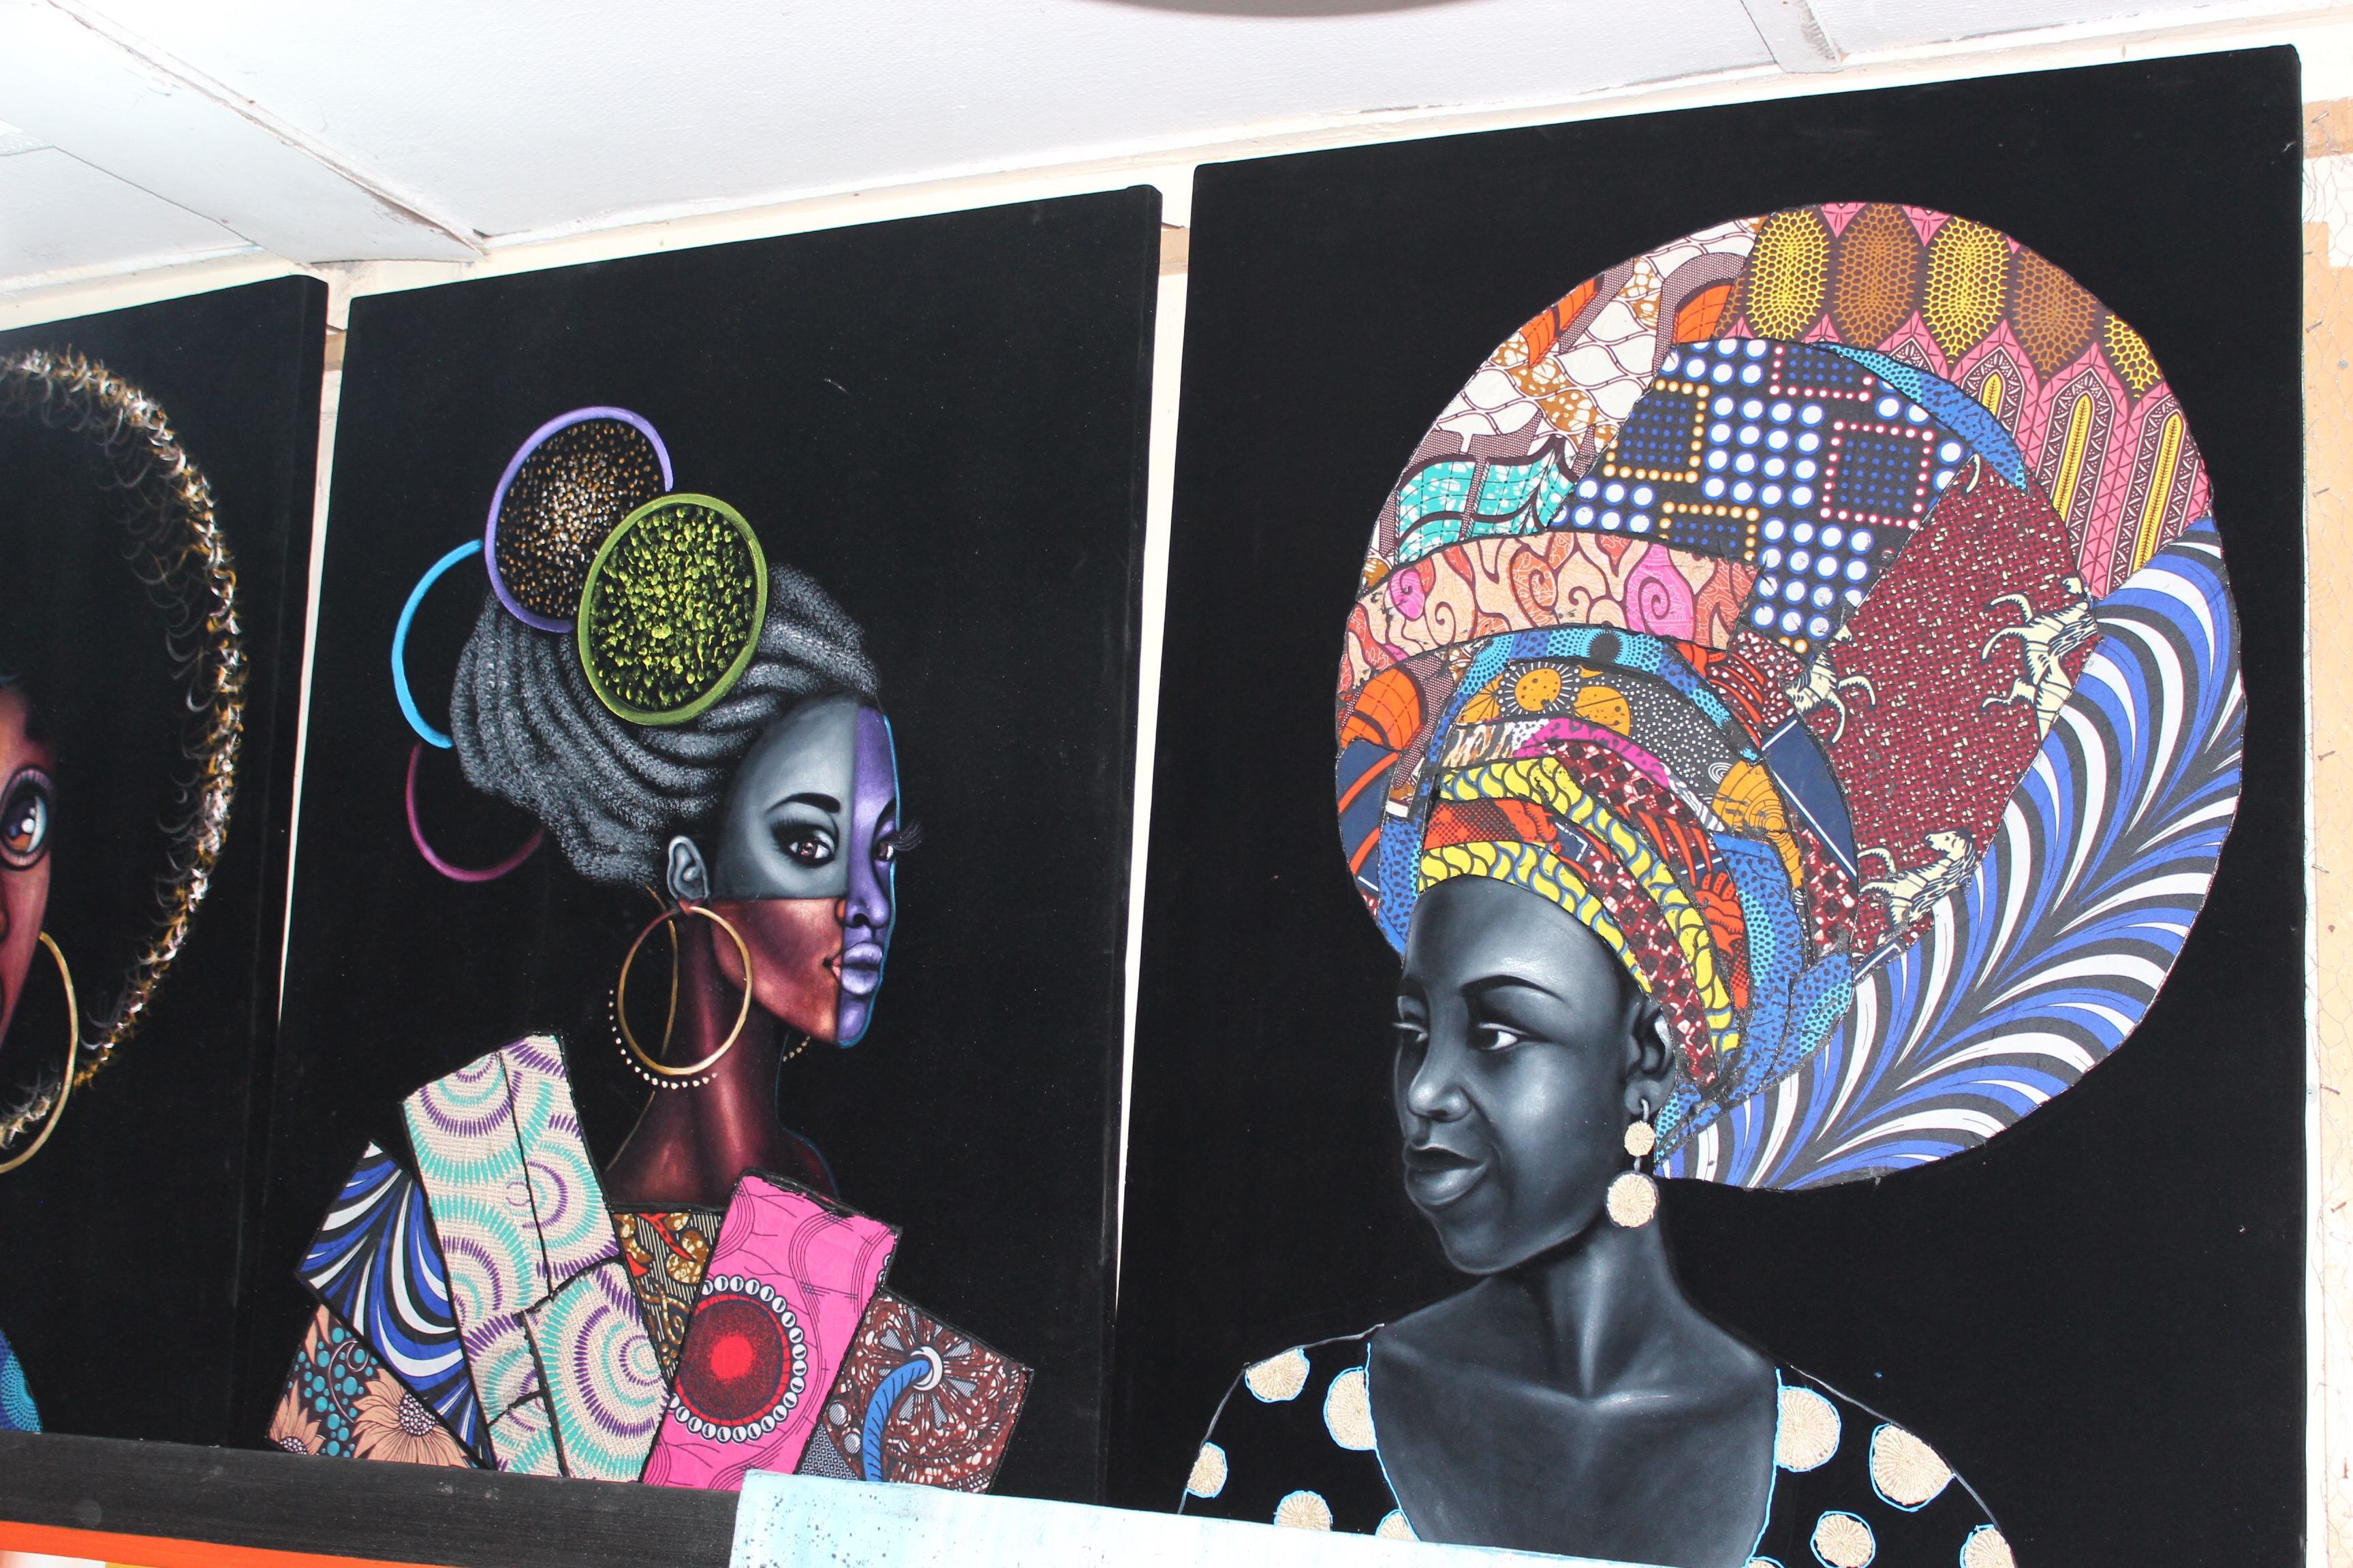 Paintings at Lekki Art Market, Lagos Nigeria